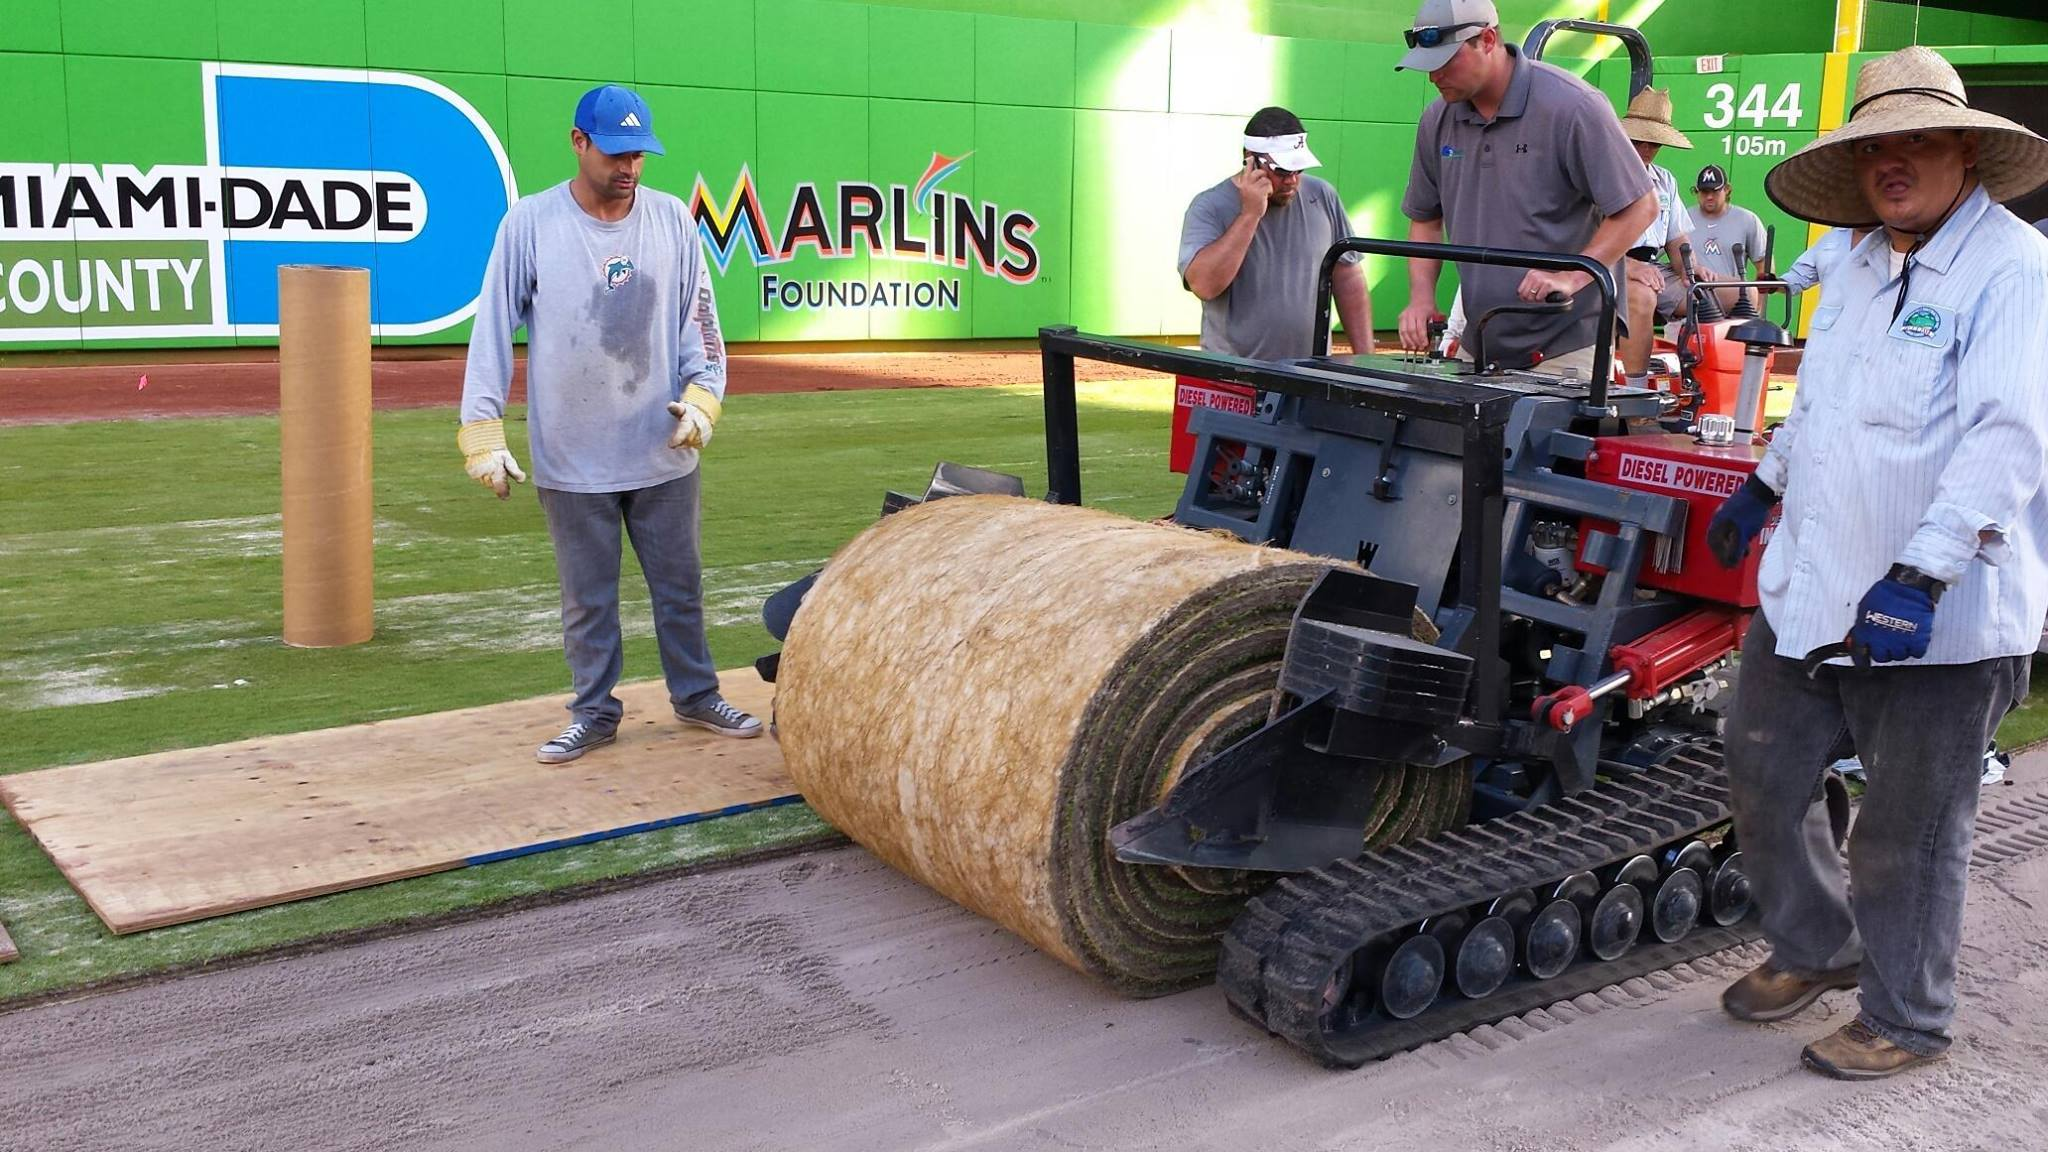 Miami Marlins Ball Park.jpg